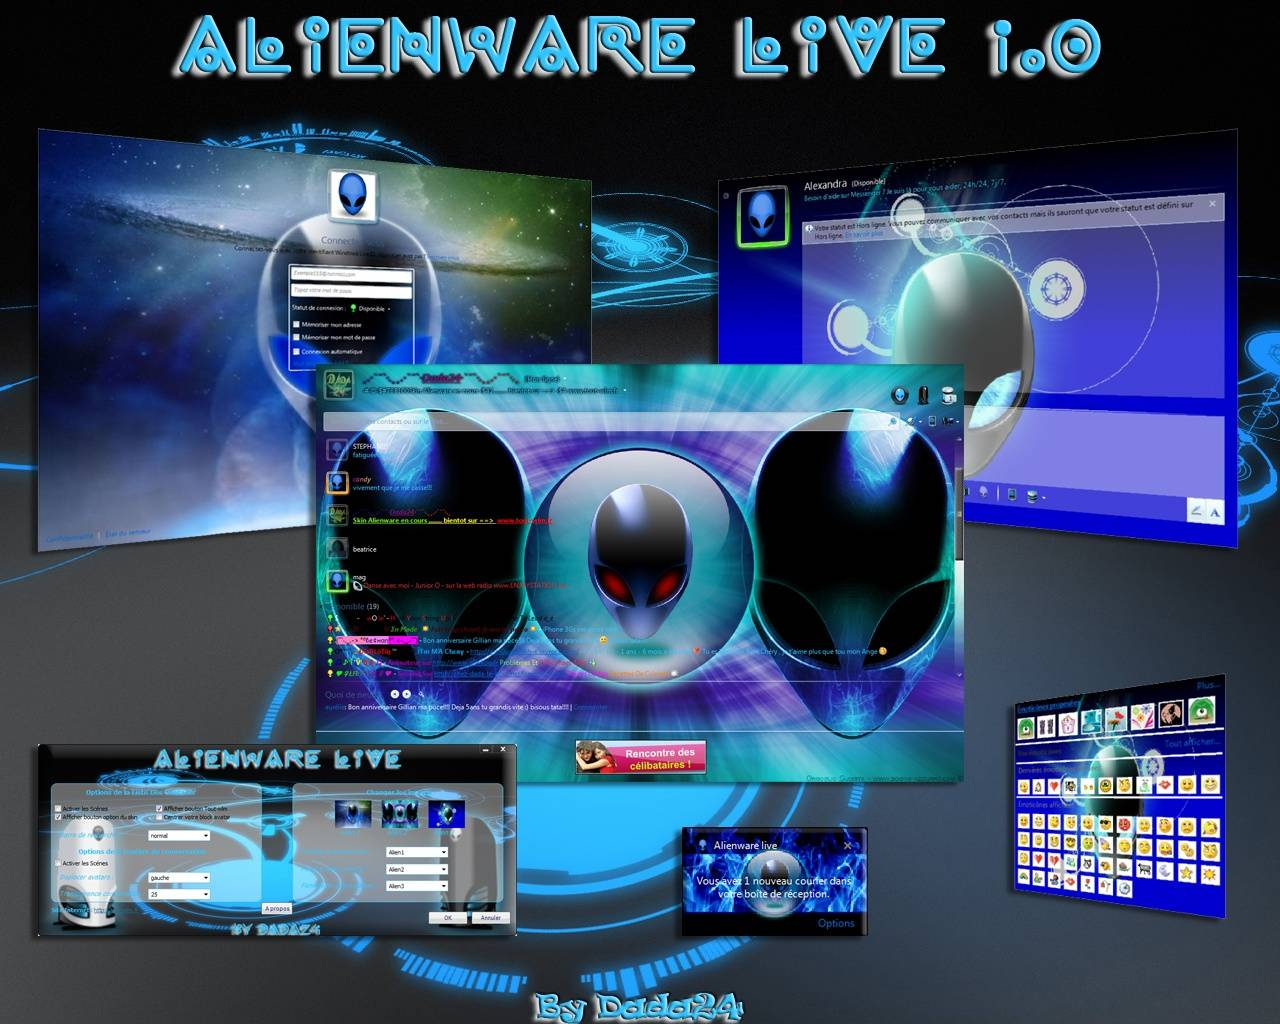 skin alienware live 1.0